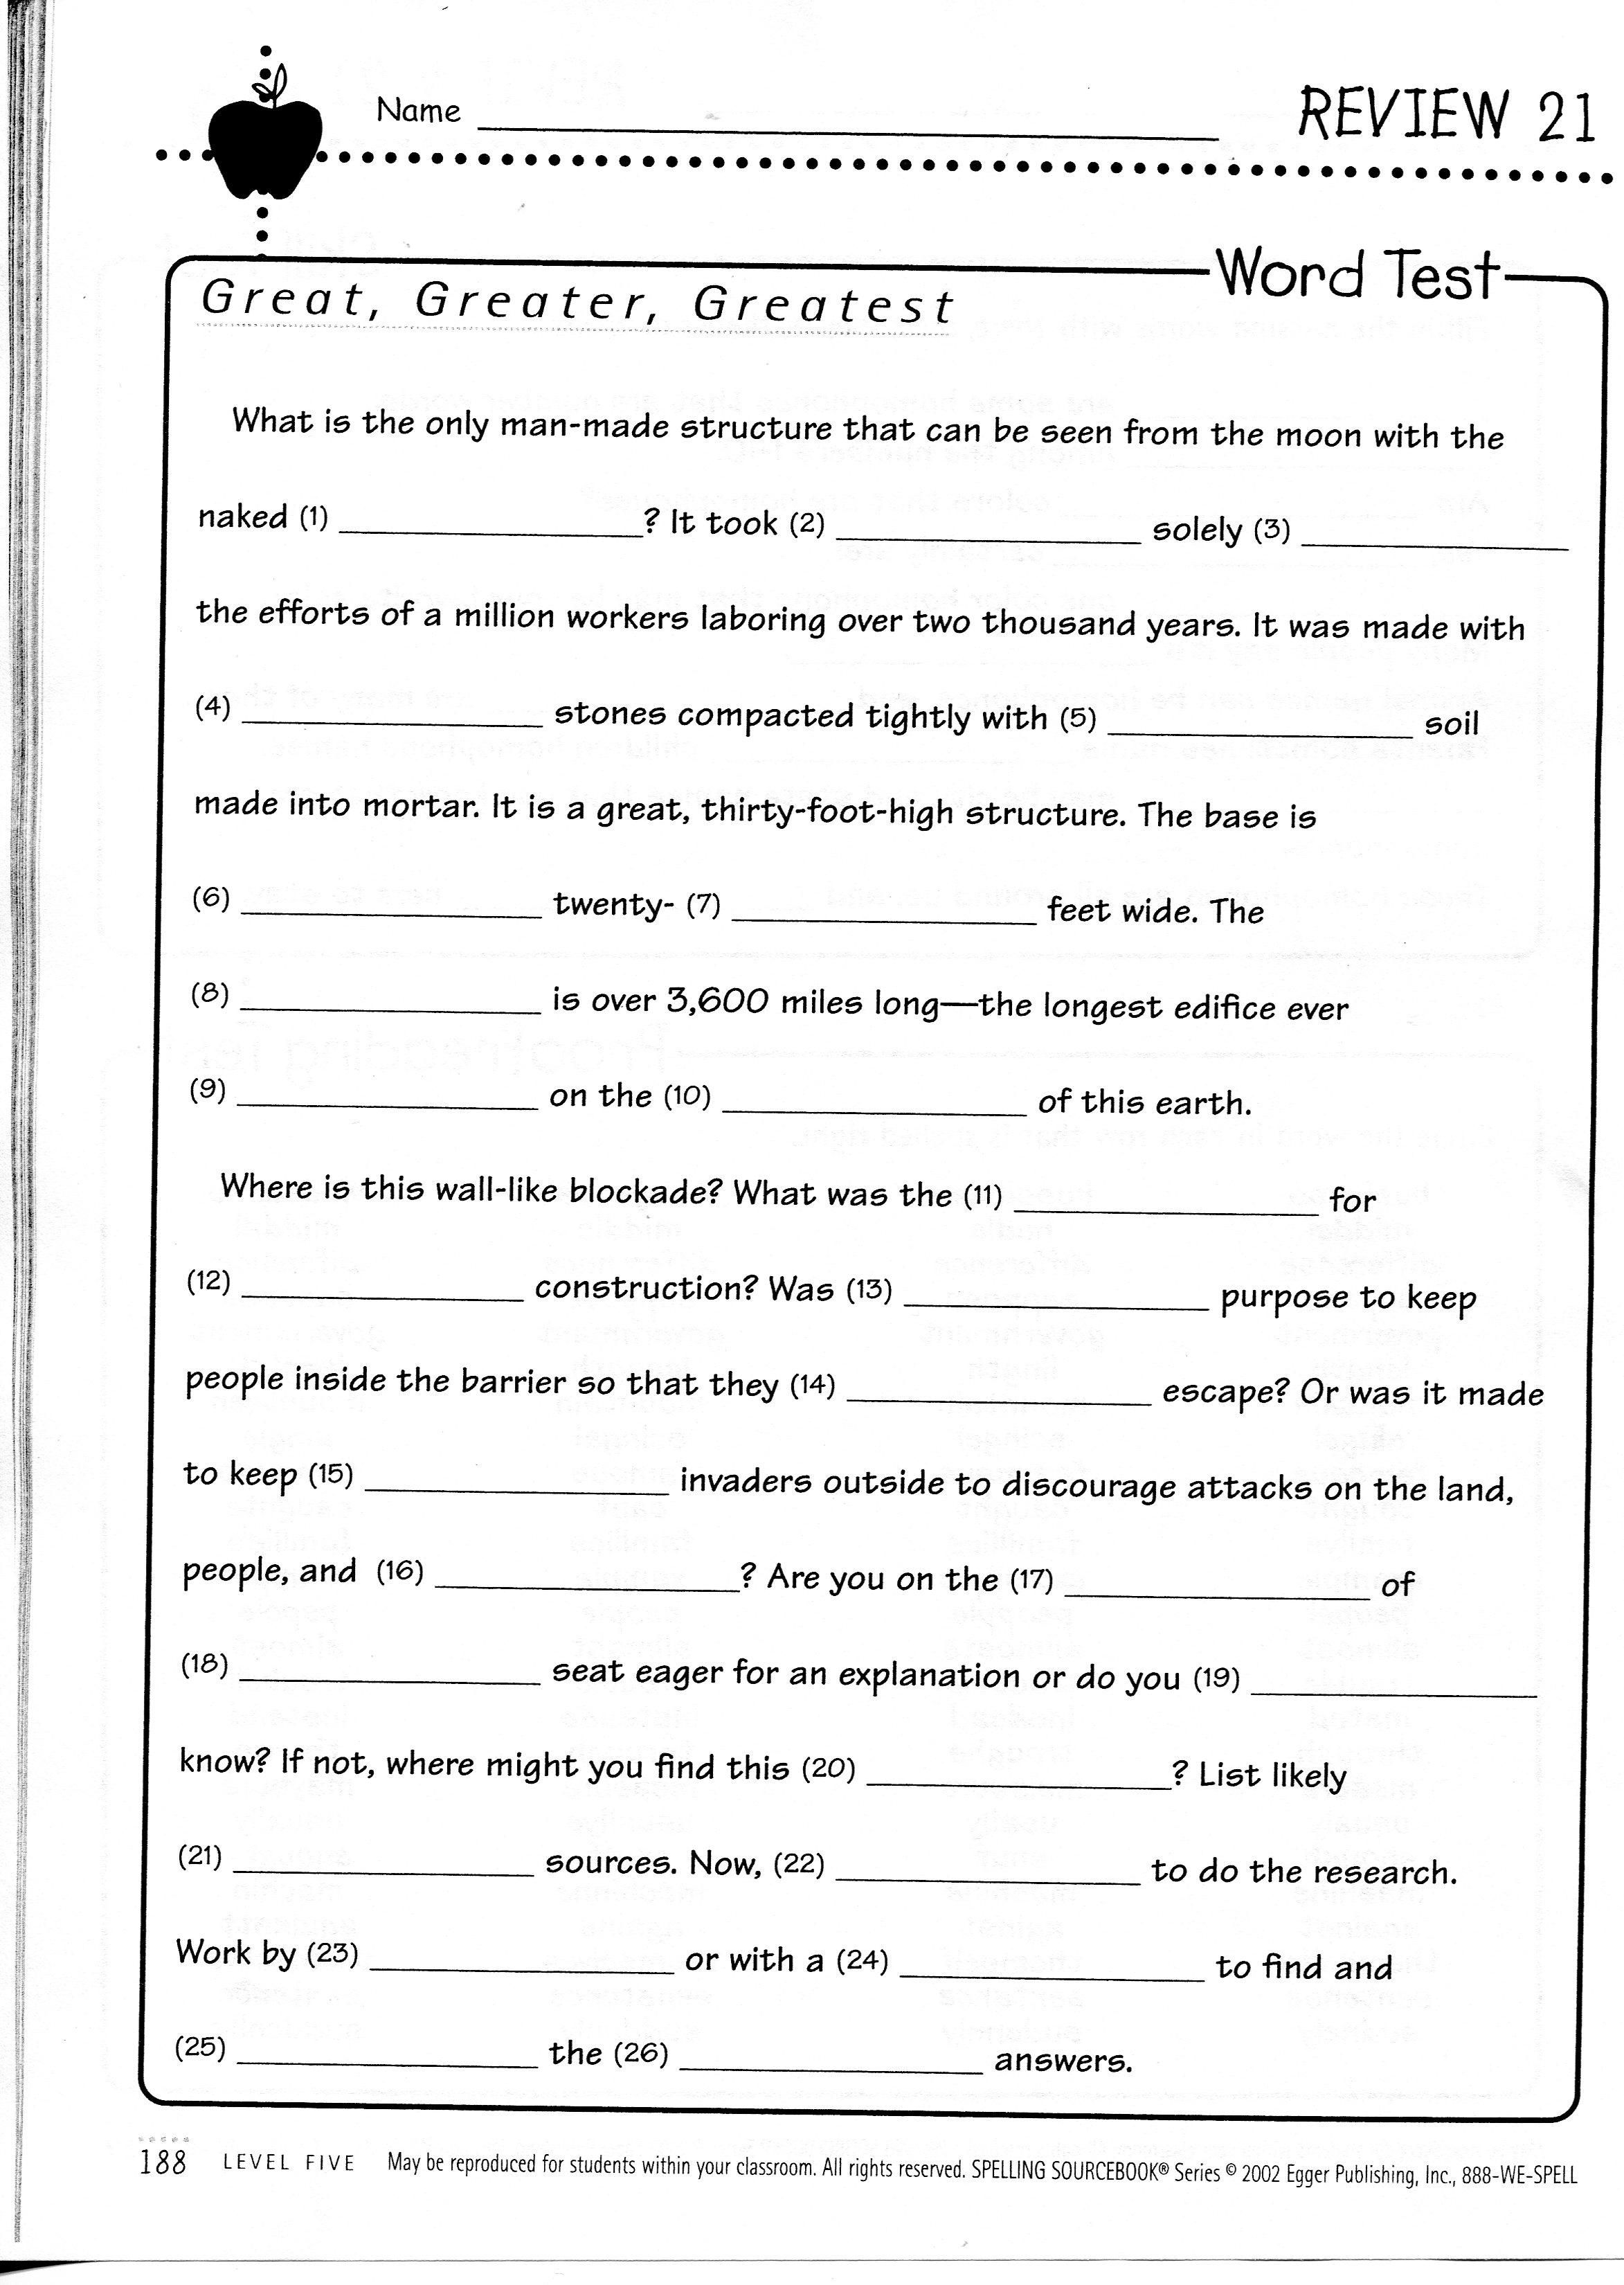 Unit 21 Spelling Test